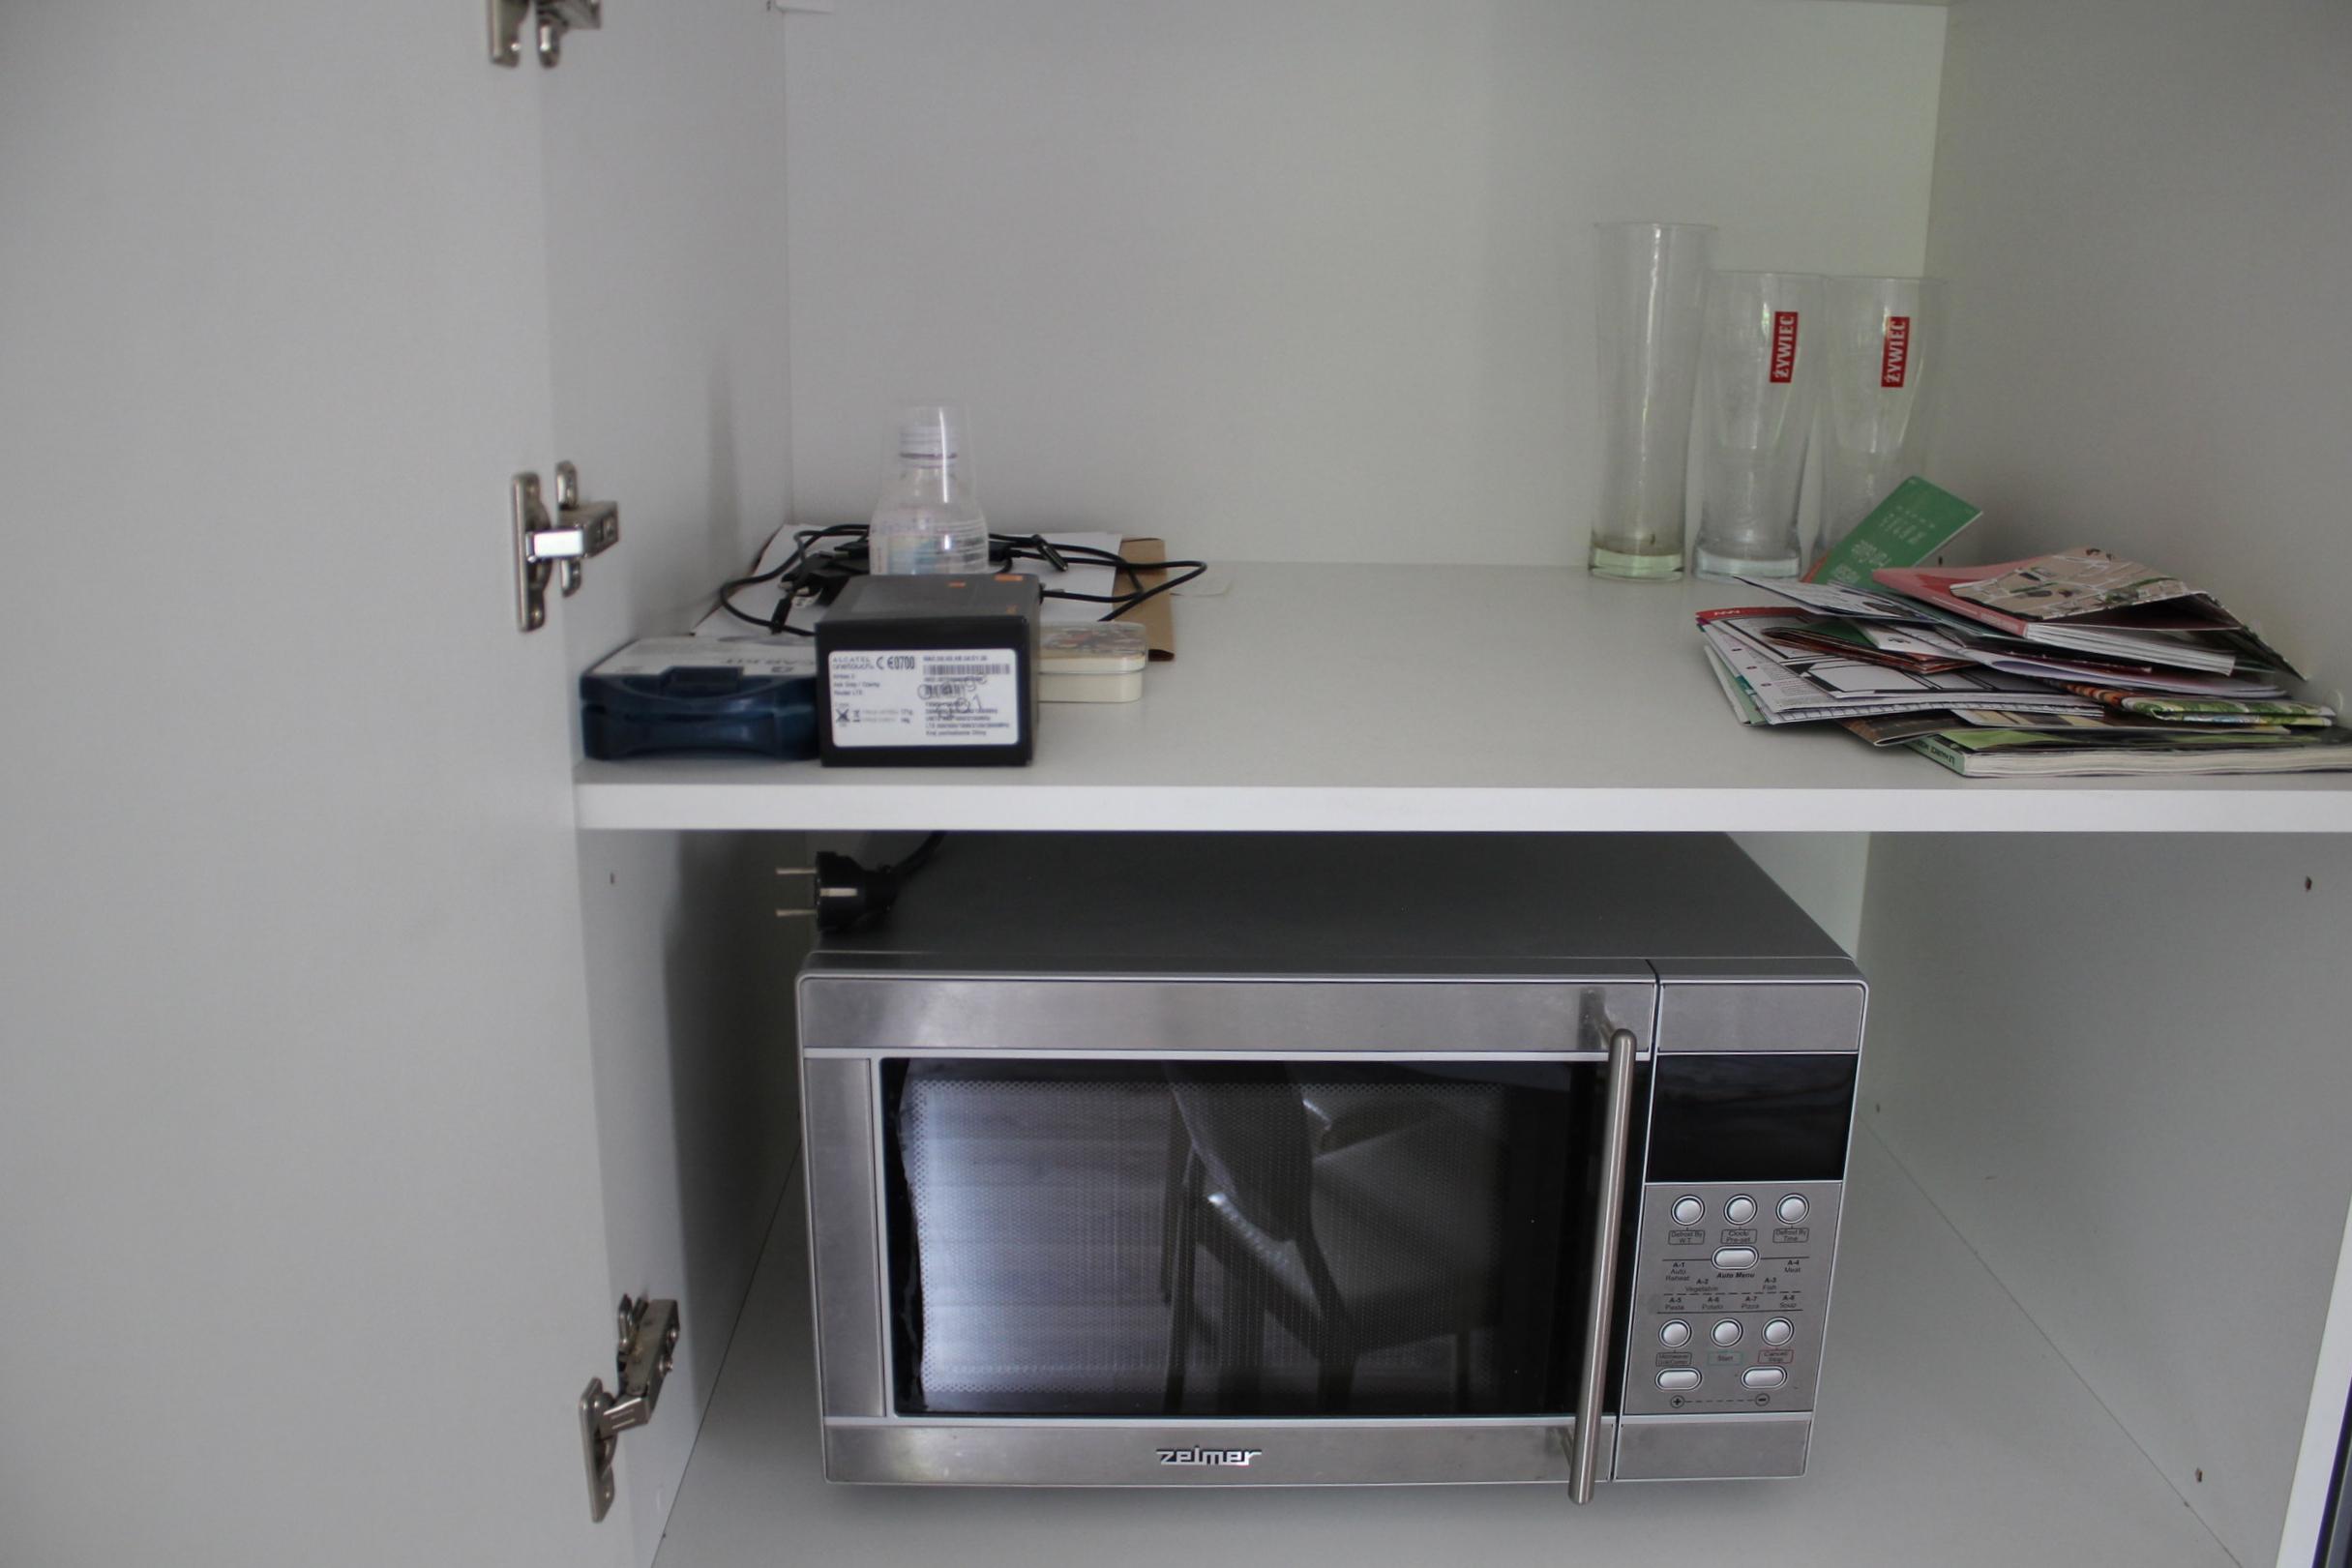 Apartament na Mariensztacie – Microwave